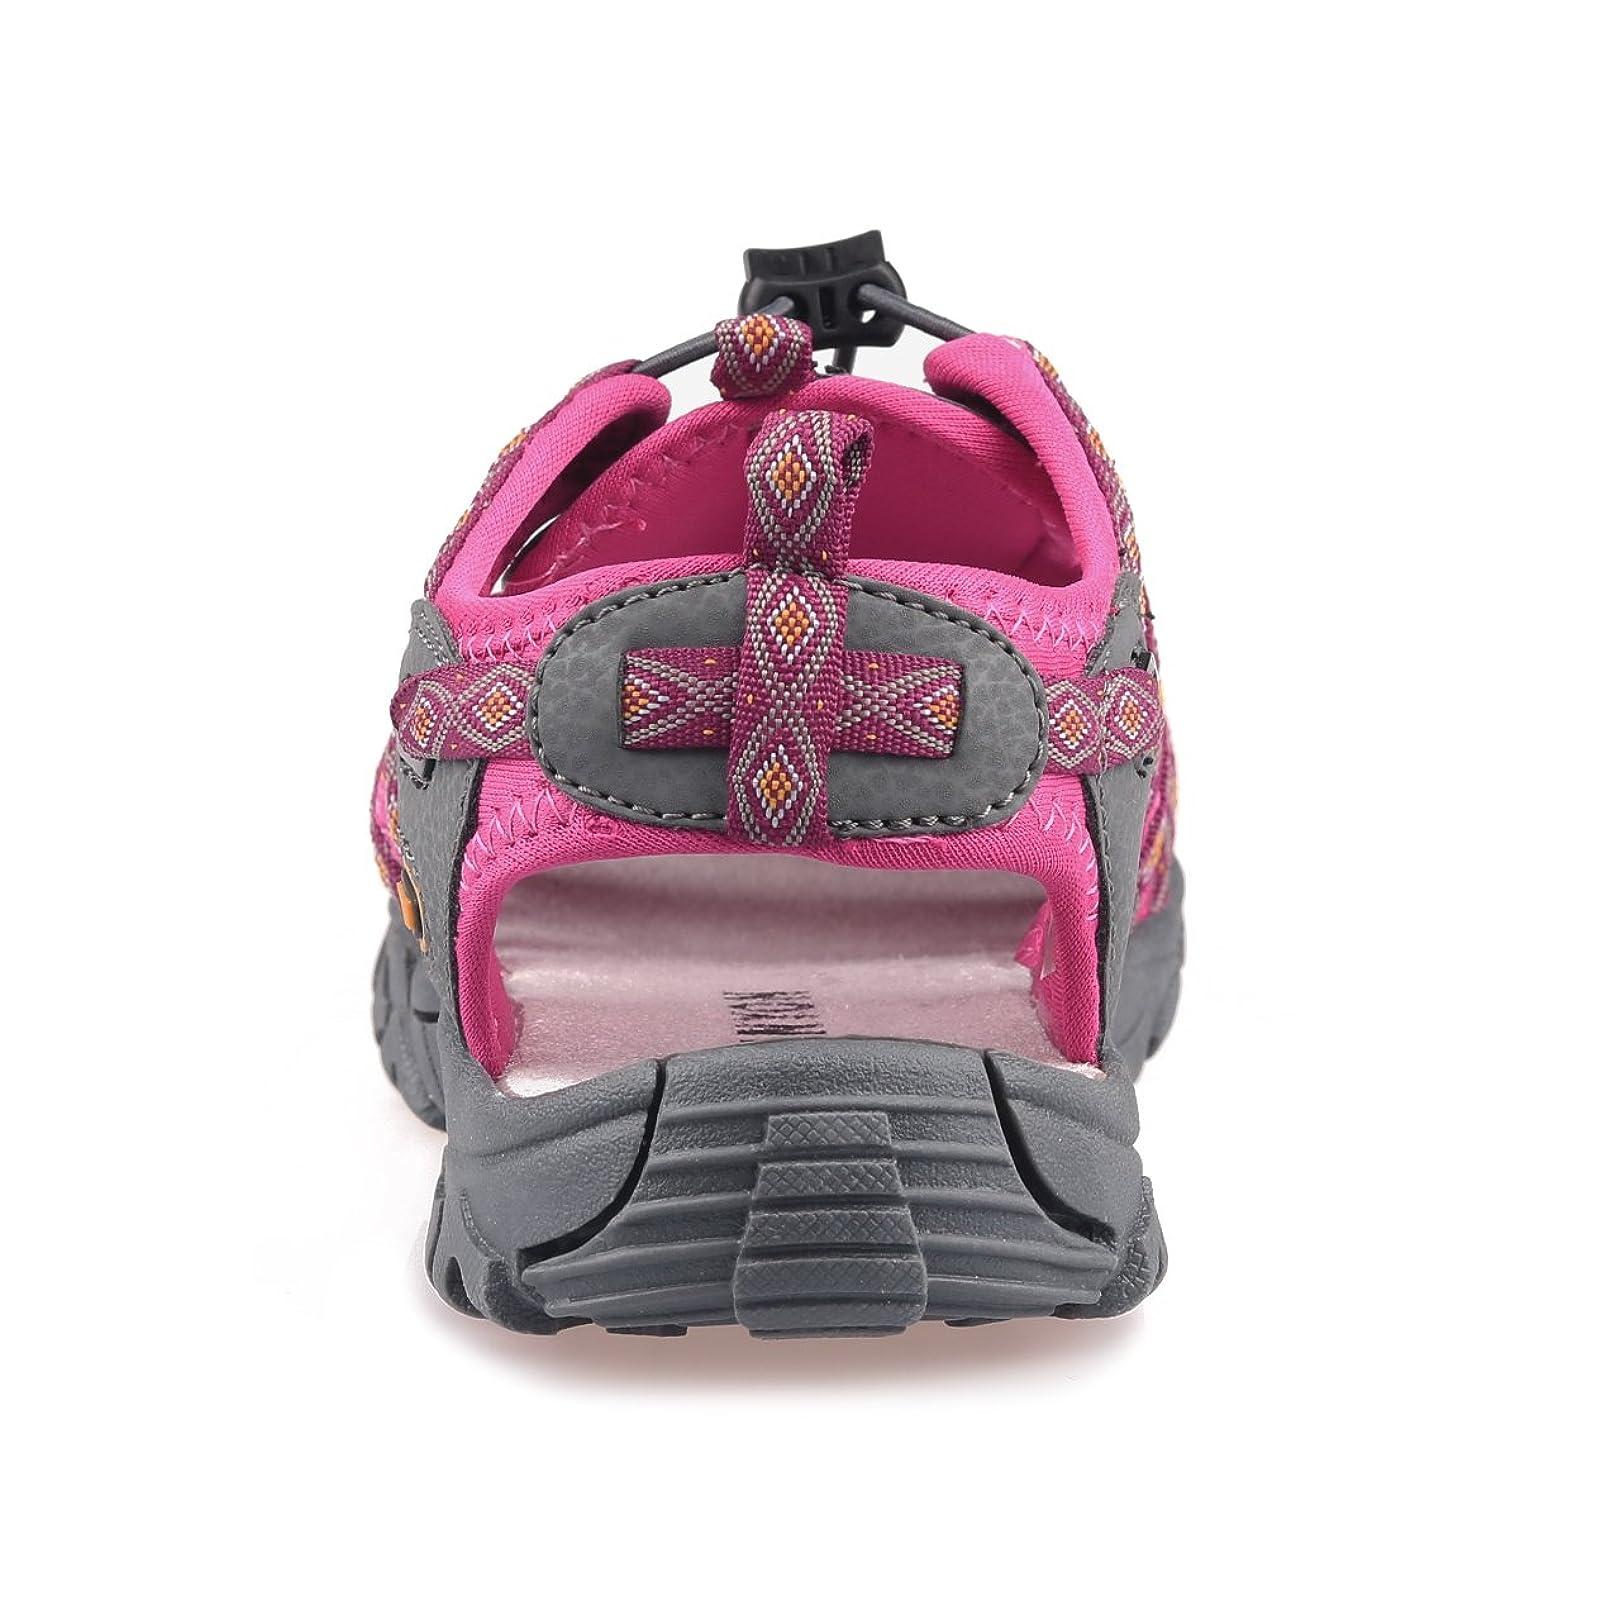 GRITION Women Outdoor Summer Sandals Adjustable Closed - 3